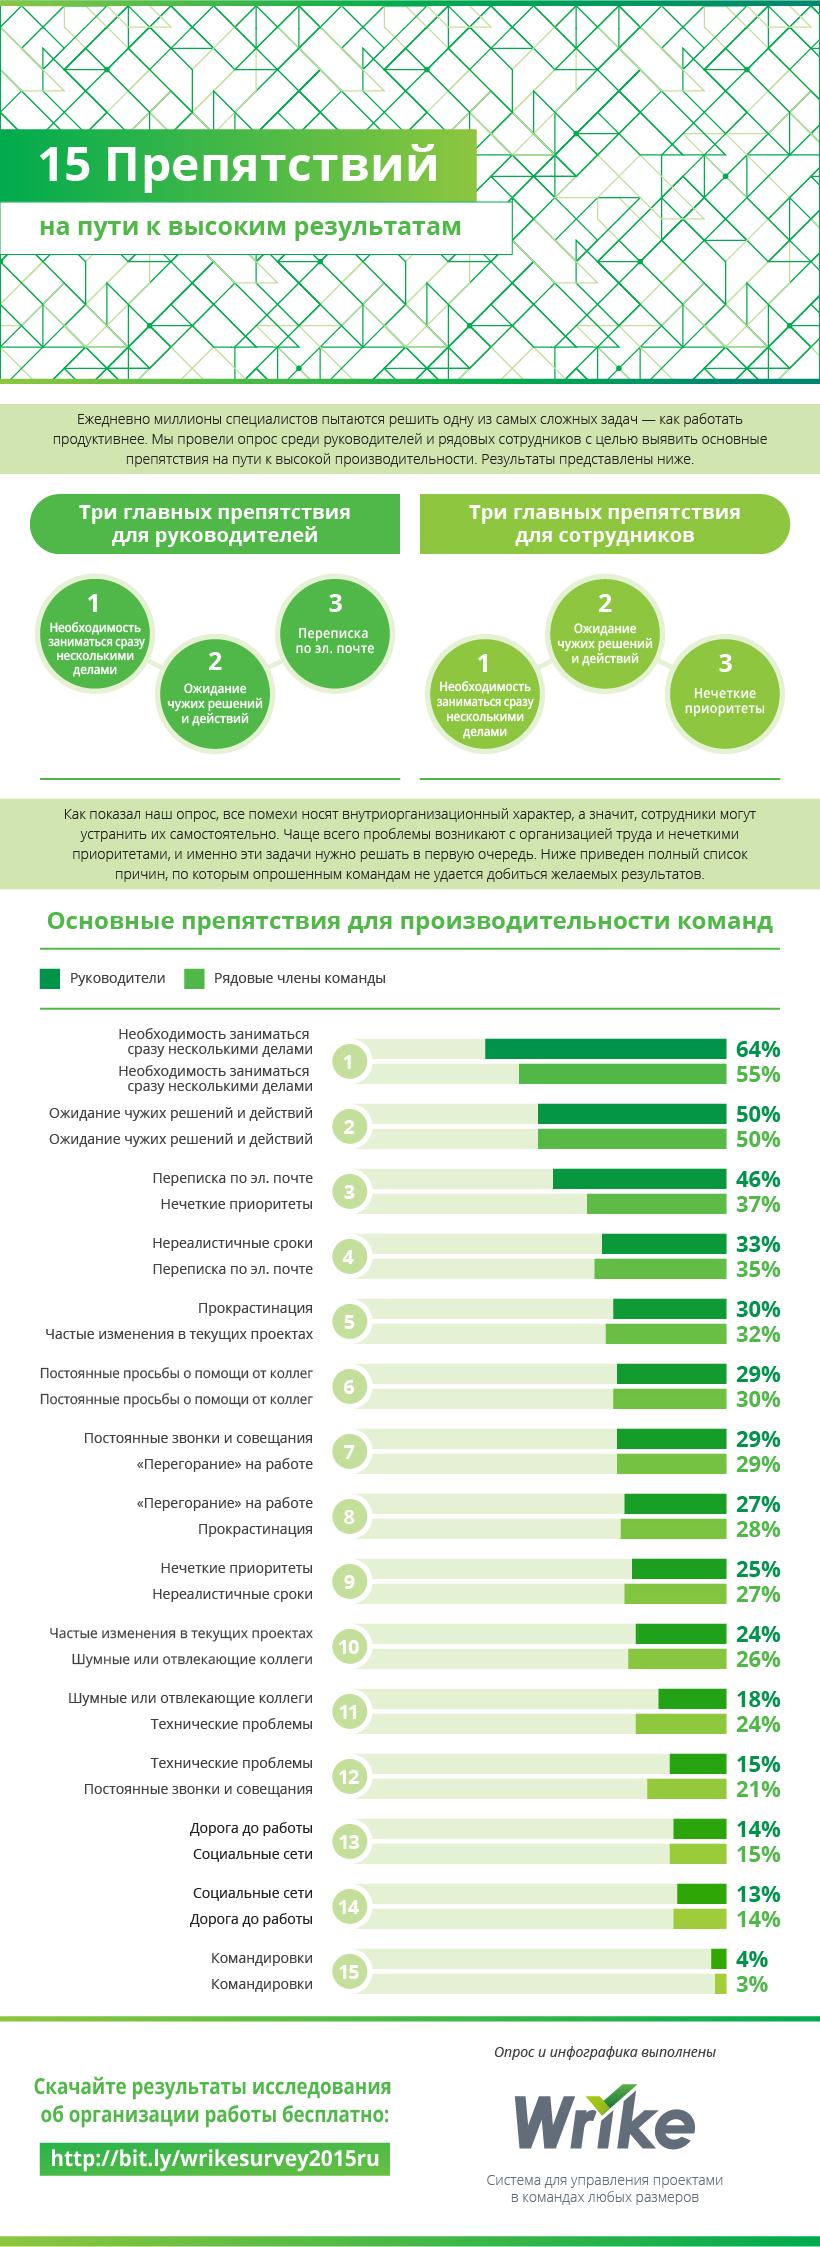 15 Roadblocks to Productivity translate_infographic 1 RU